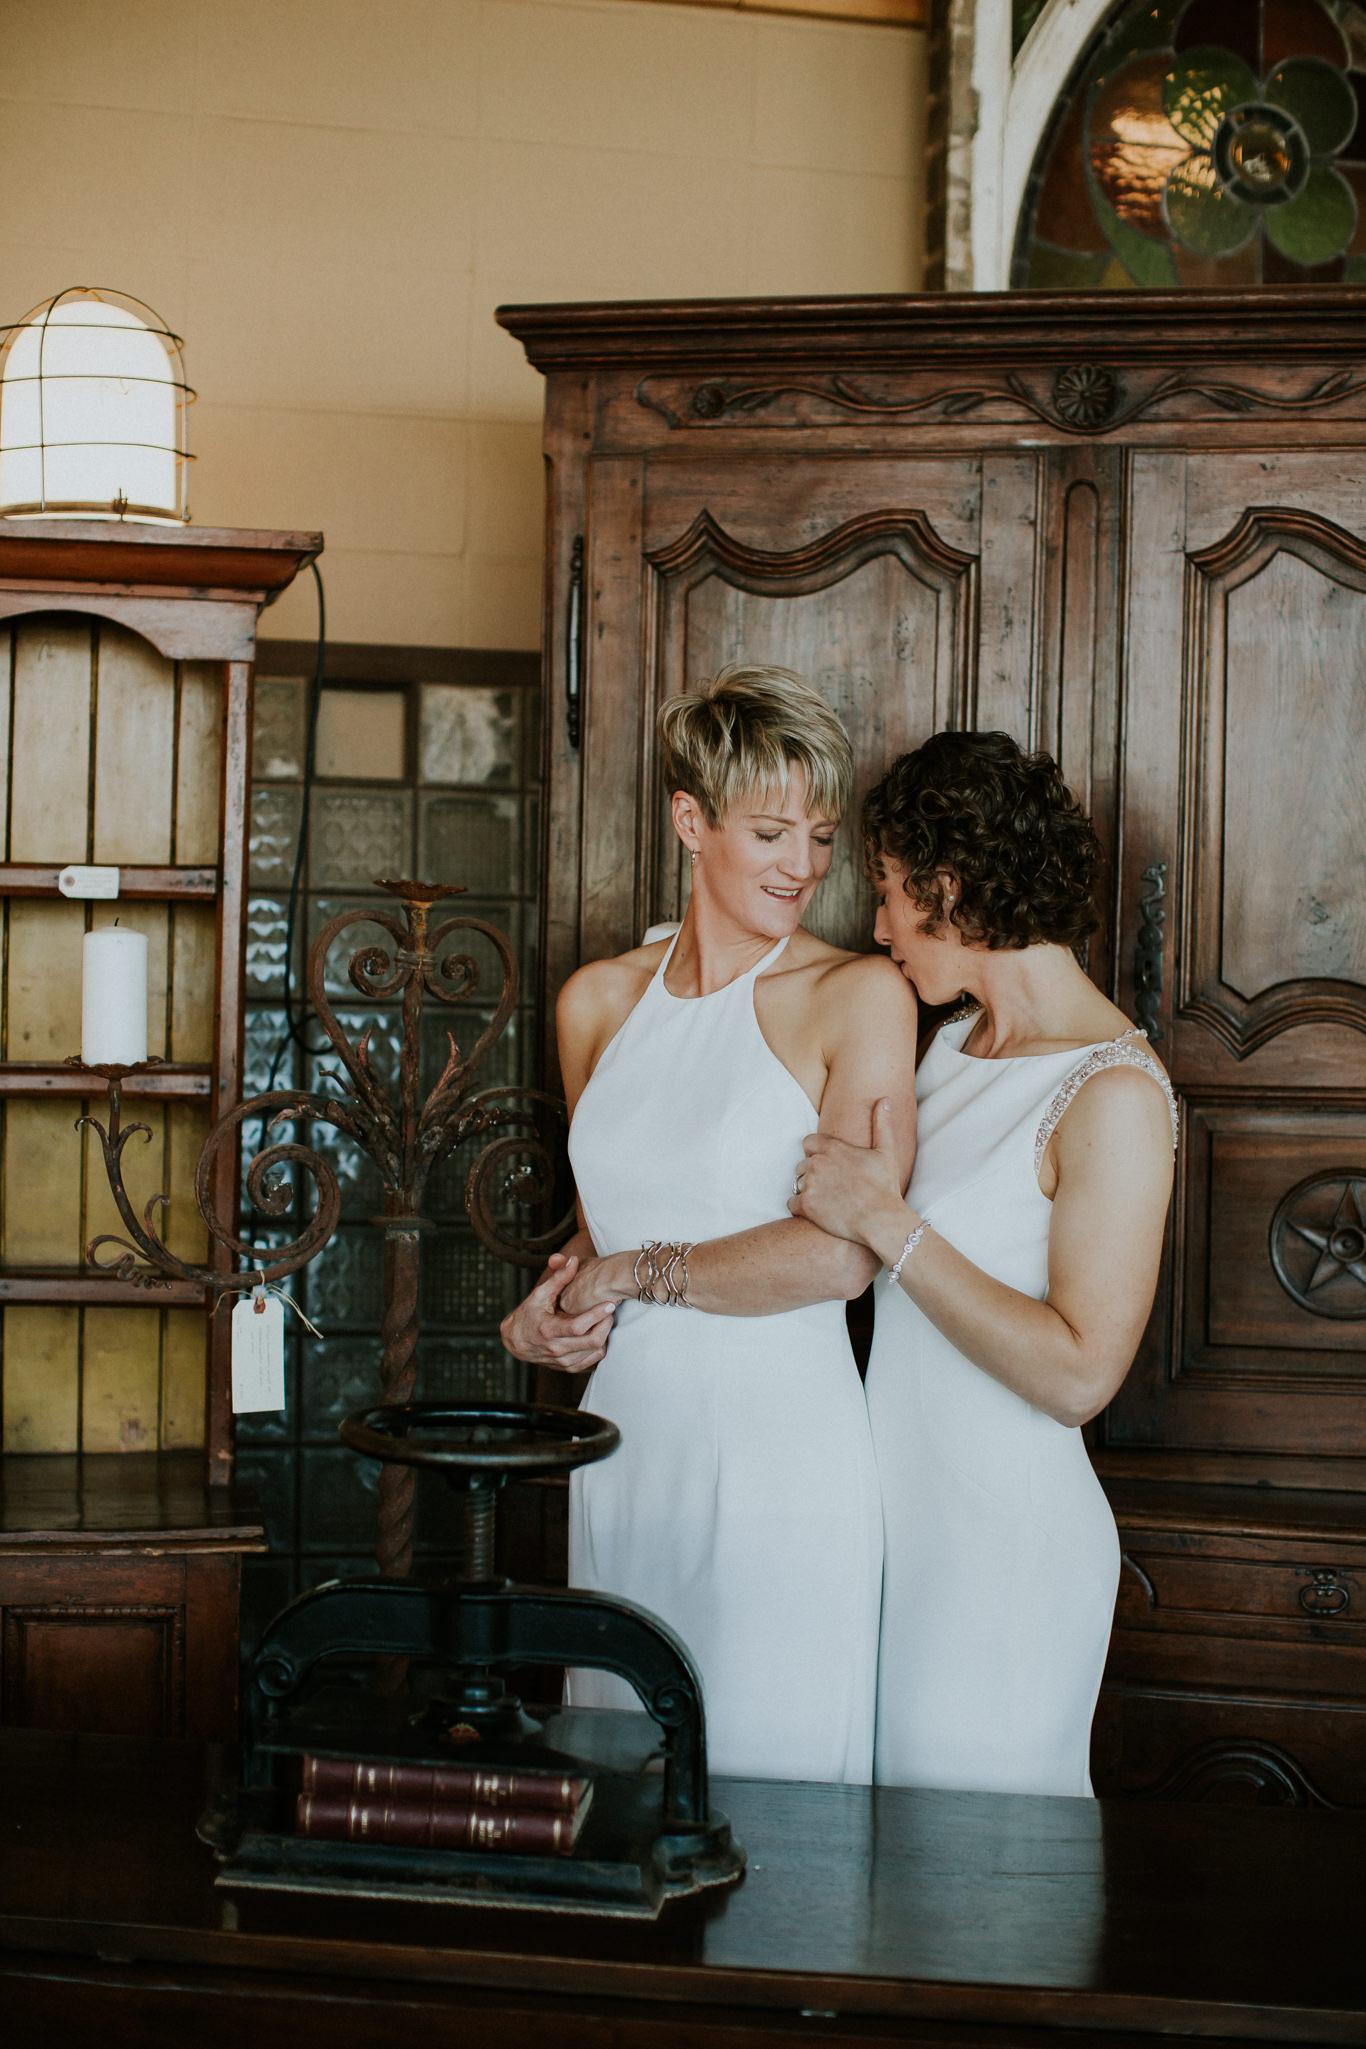 Lindsay-and-Heather-Charbar-Restaurant-Wedding-in-Calgary-29